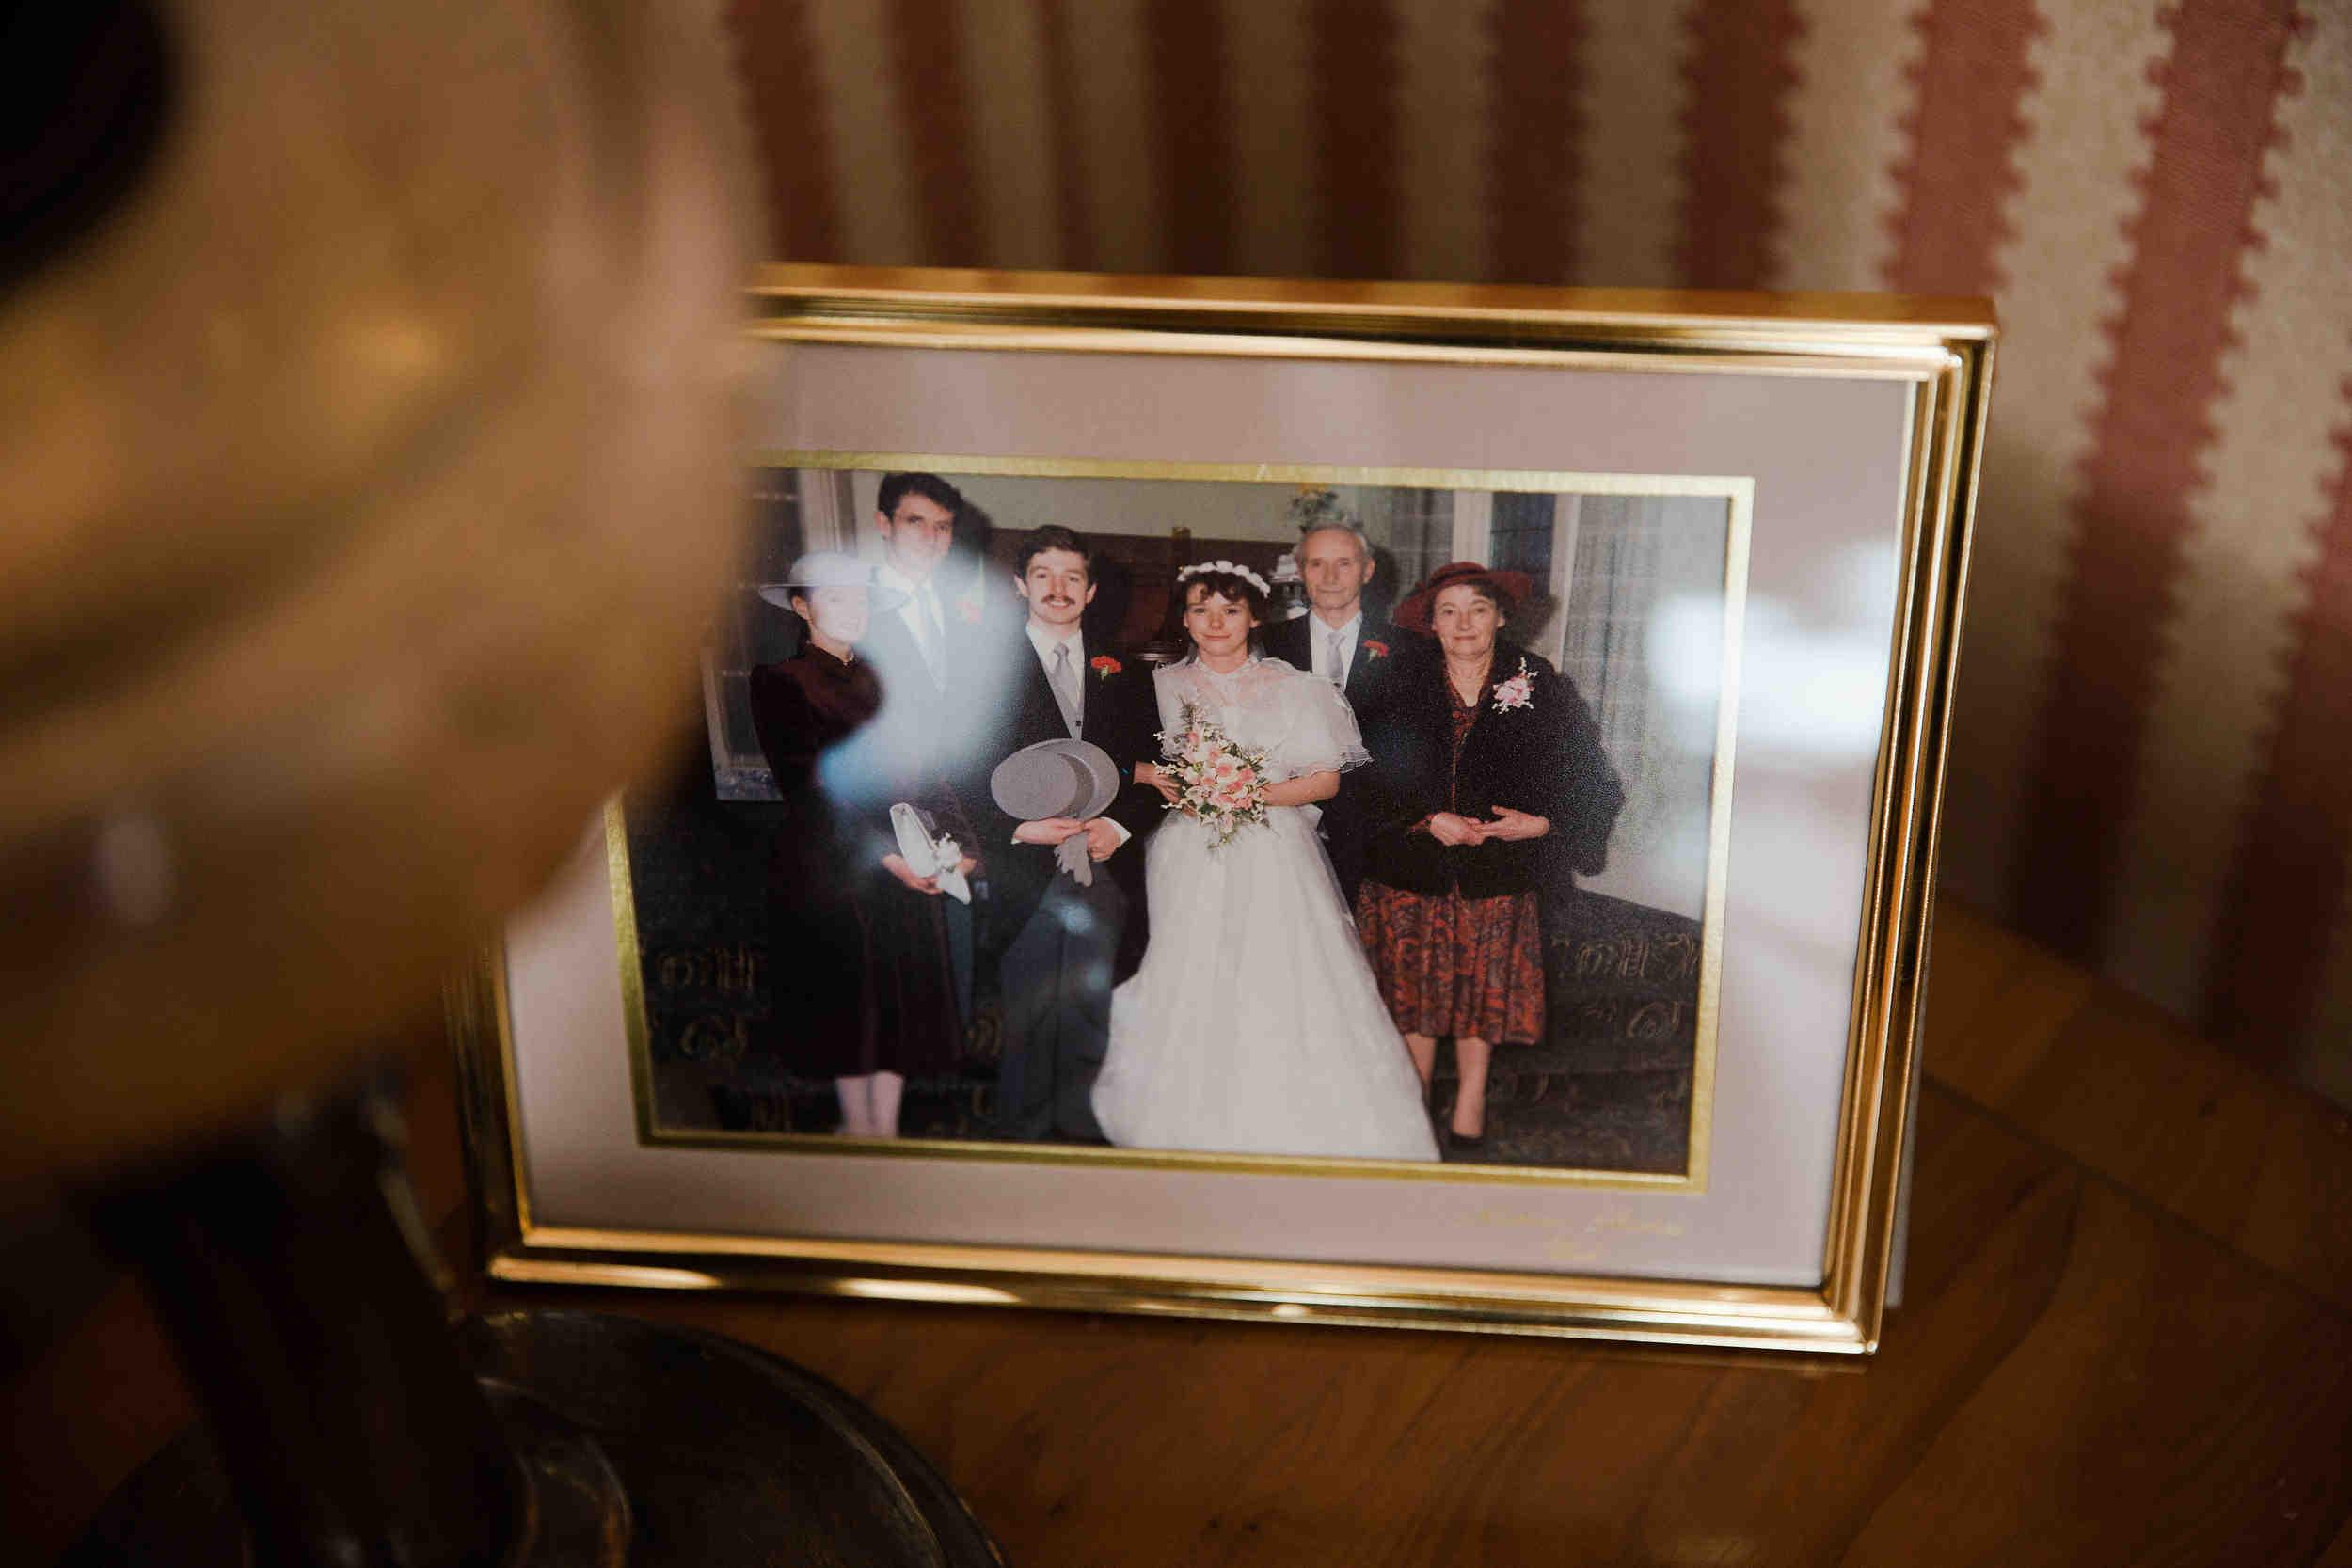 Modern_Stylish_Wedding_at_Swallows_Nest_Barn1133